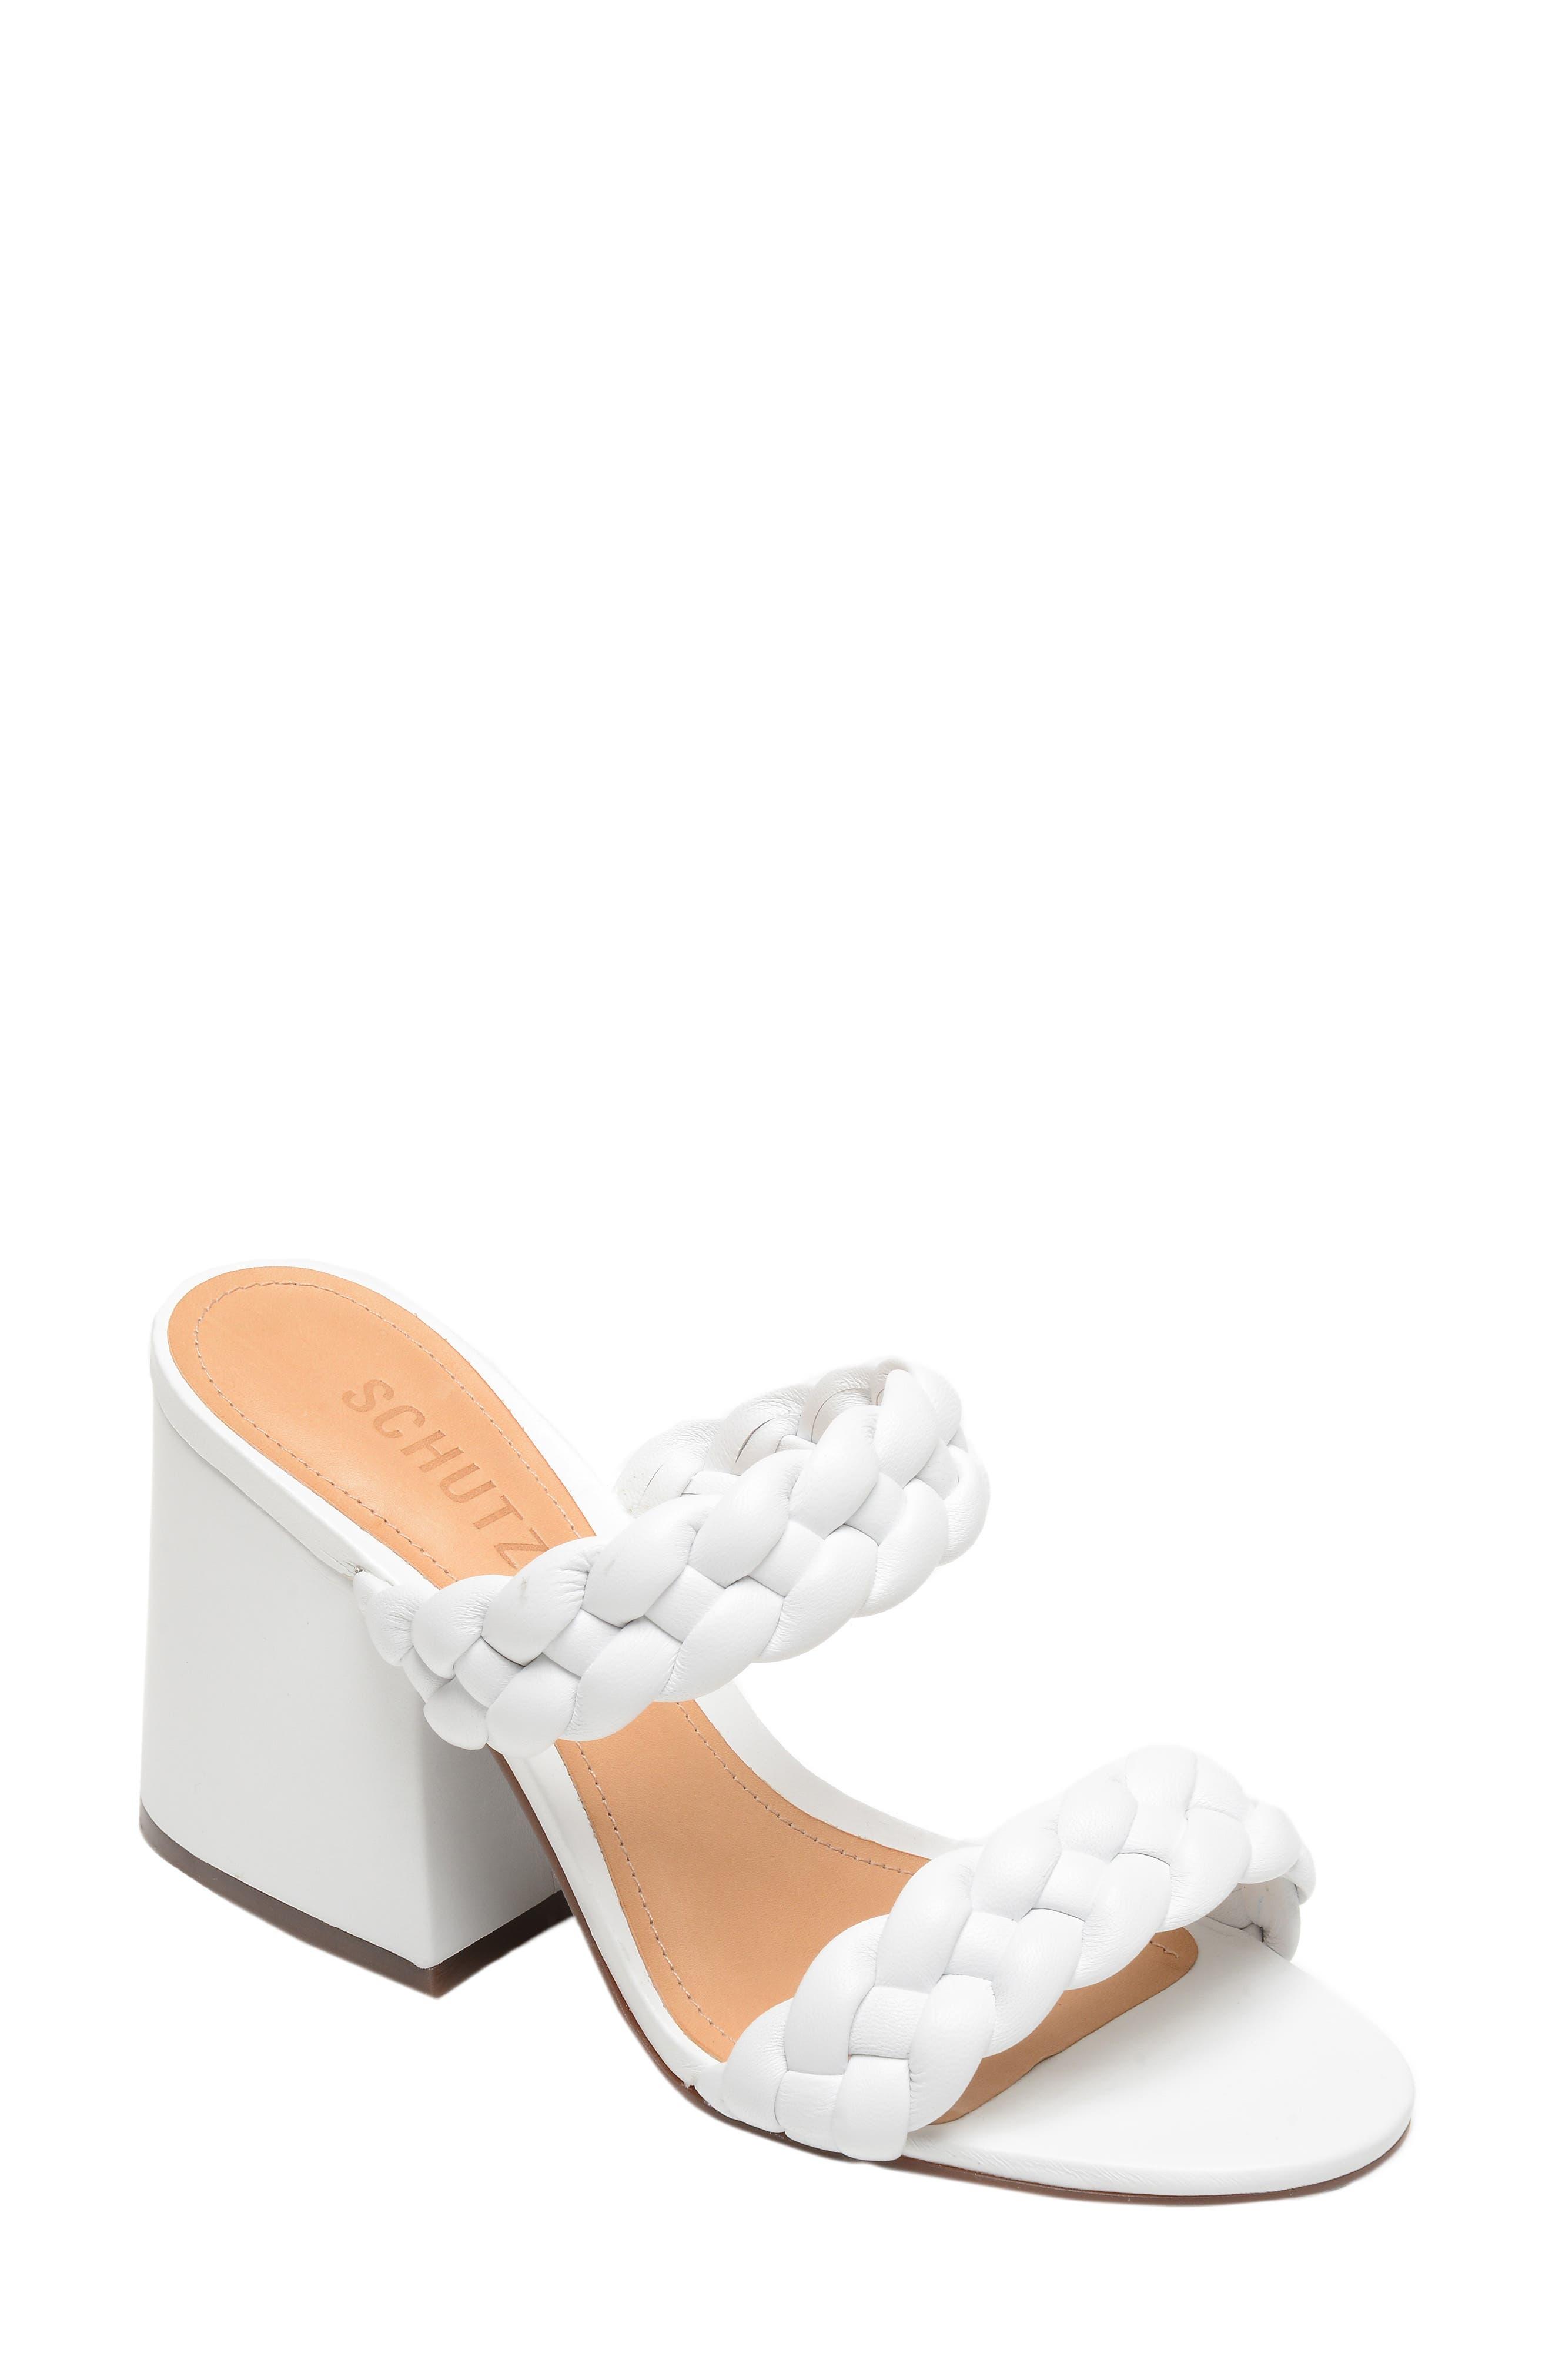 ae42539b2a10 Schutz Elida Block Heel Slide Sandal